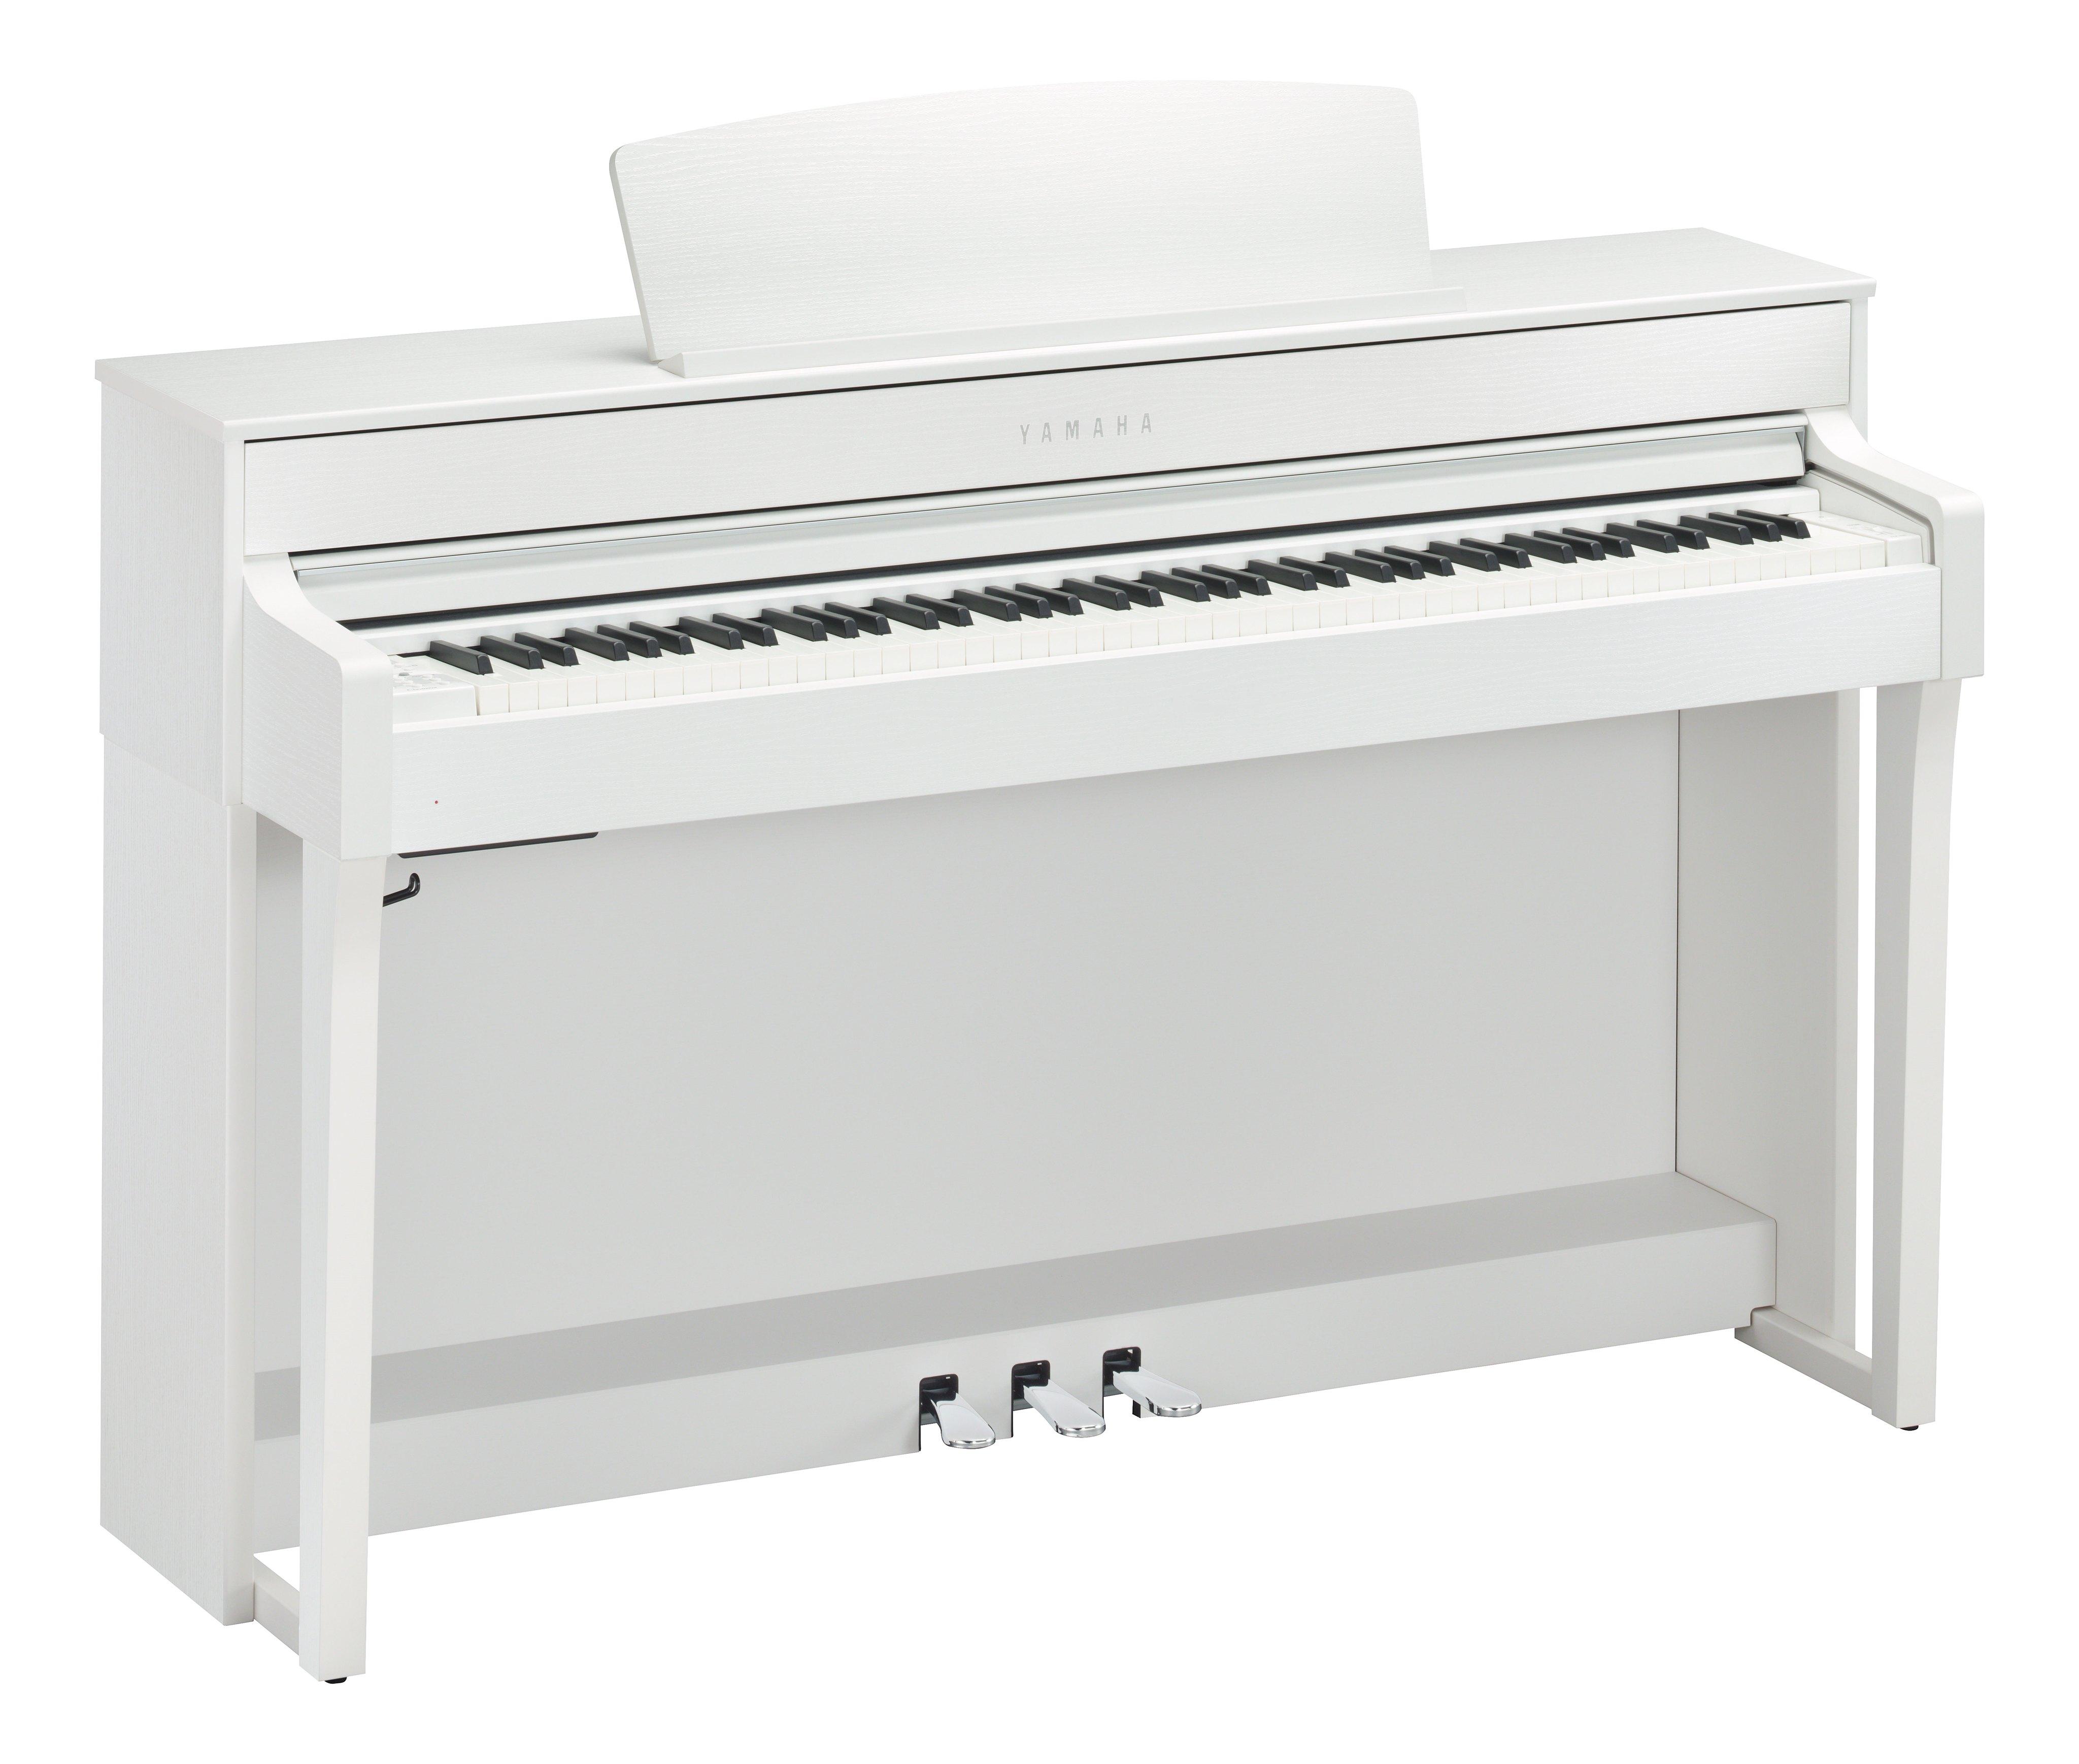 Yamaha Clavinova<br/>CLP-645 <br/>5 Jahre Garantie<br/>NEW